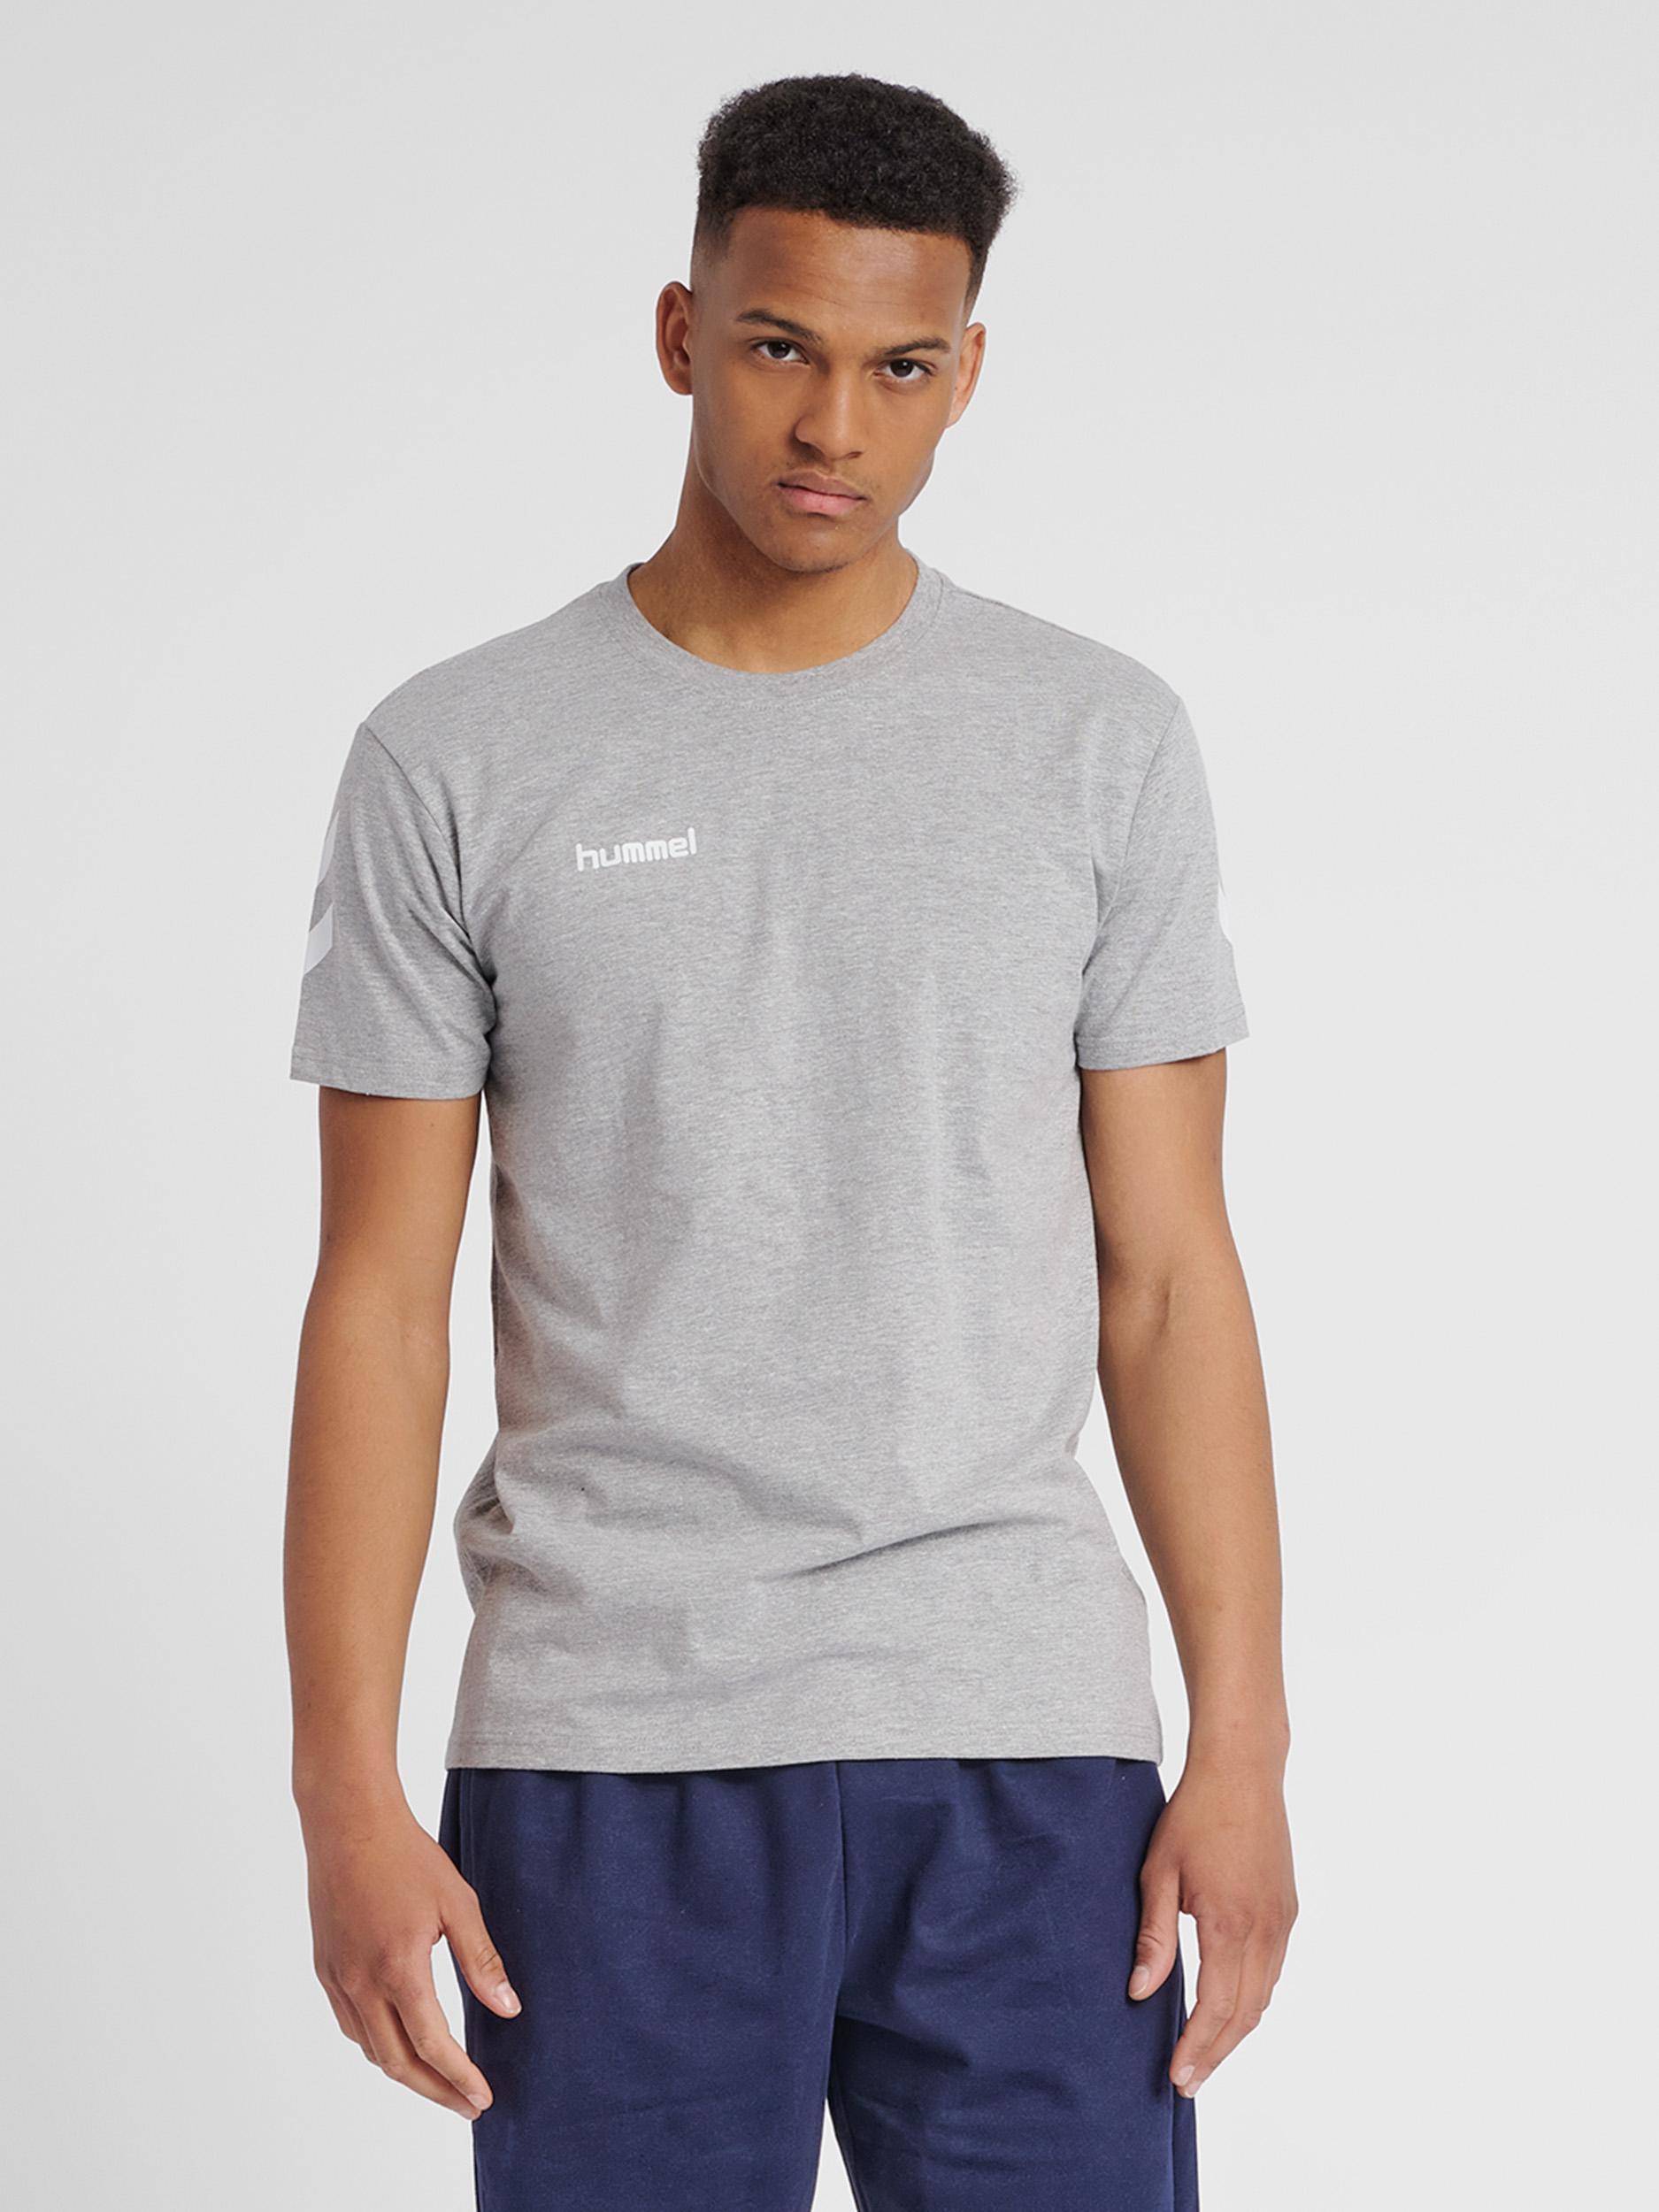 hummel T-shirt med vinkler på ærmerne grå Herre